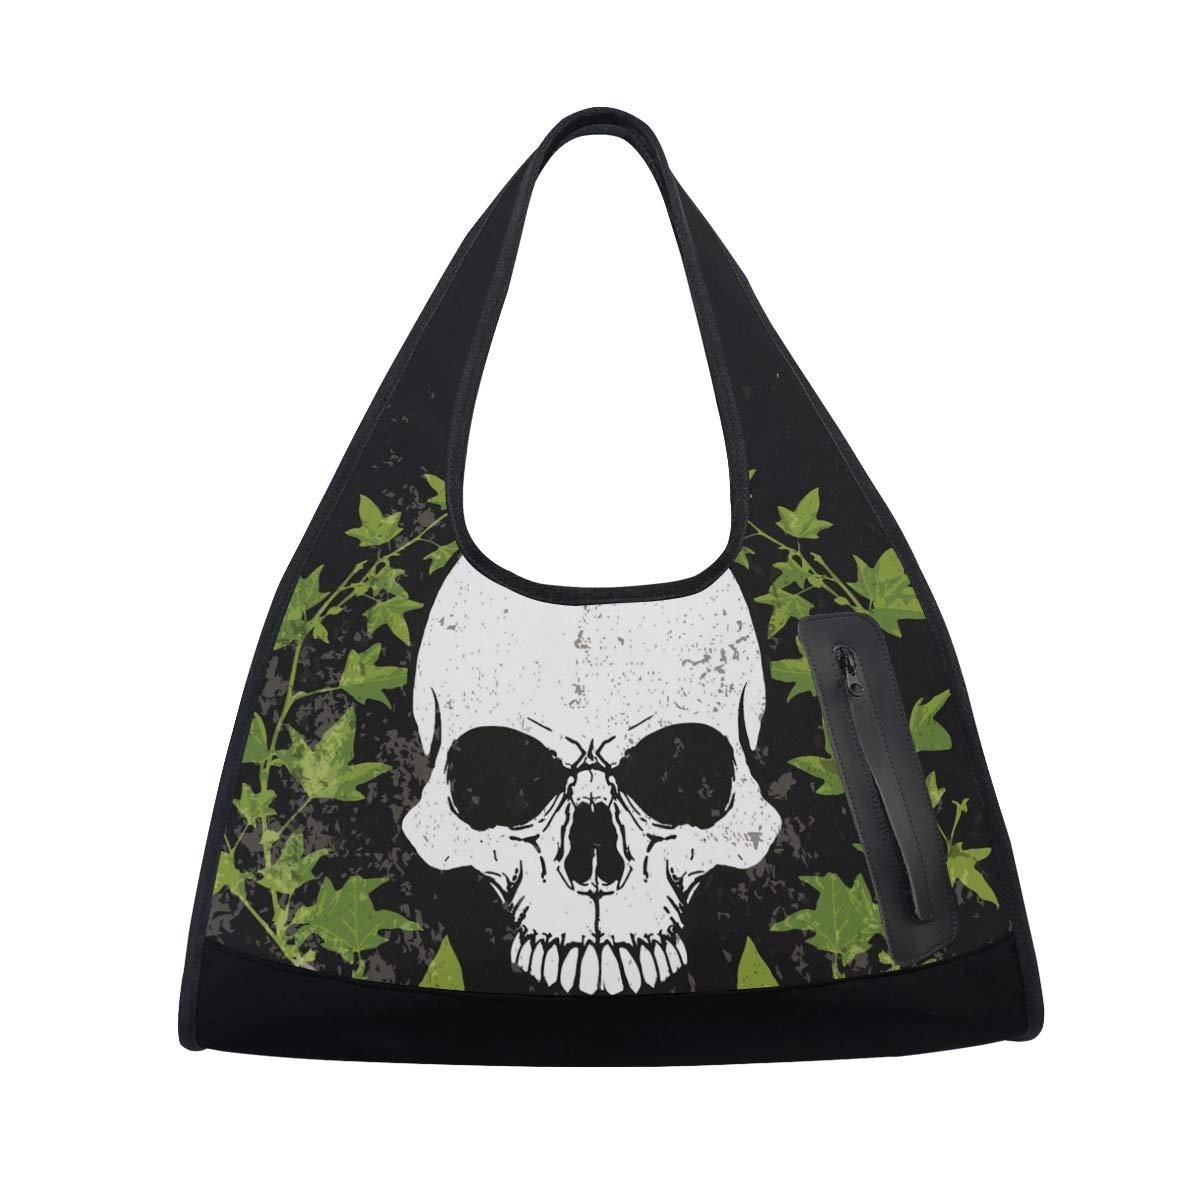 Gym Bag Sports Holdall Watercolor Skull Canvas Shoulder Bag Overnight Travel Bag for Men and Women